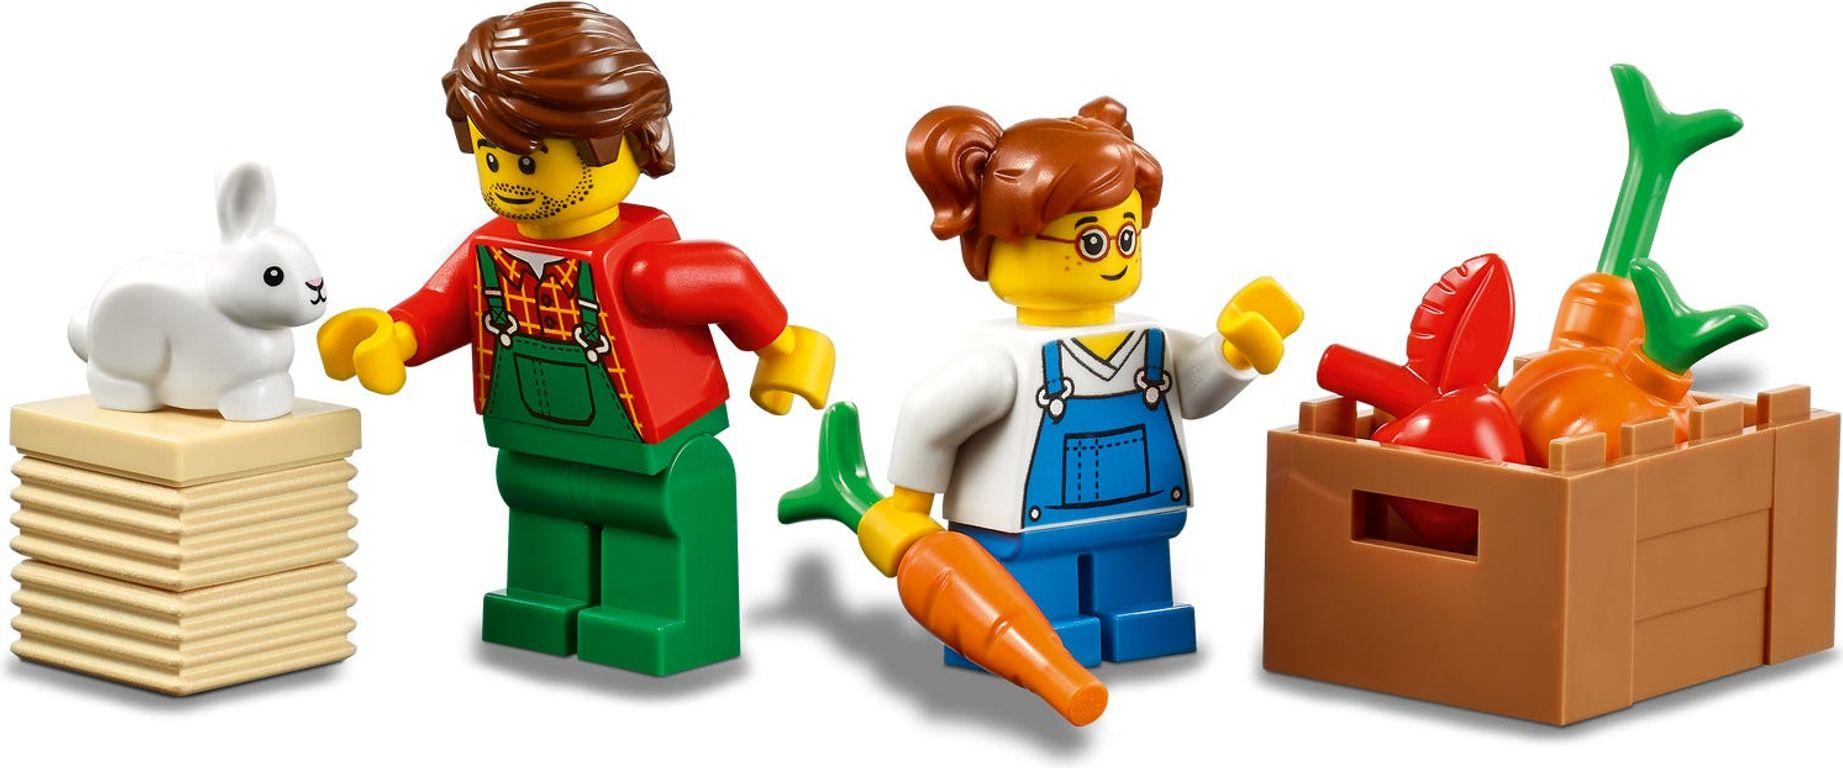 LEGO® City Tractor minifigures